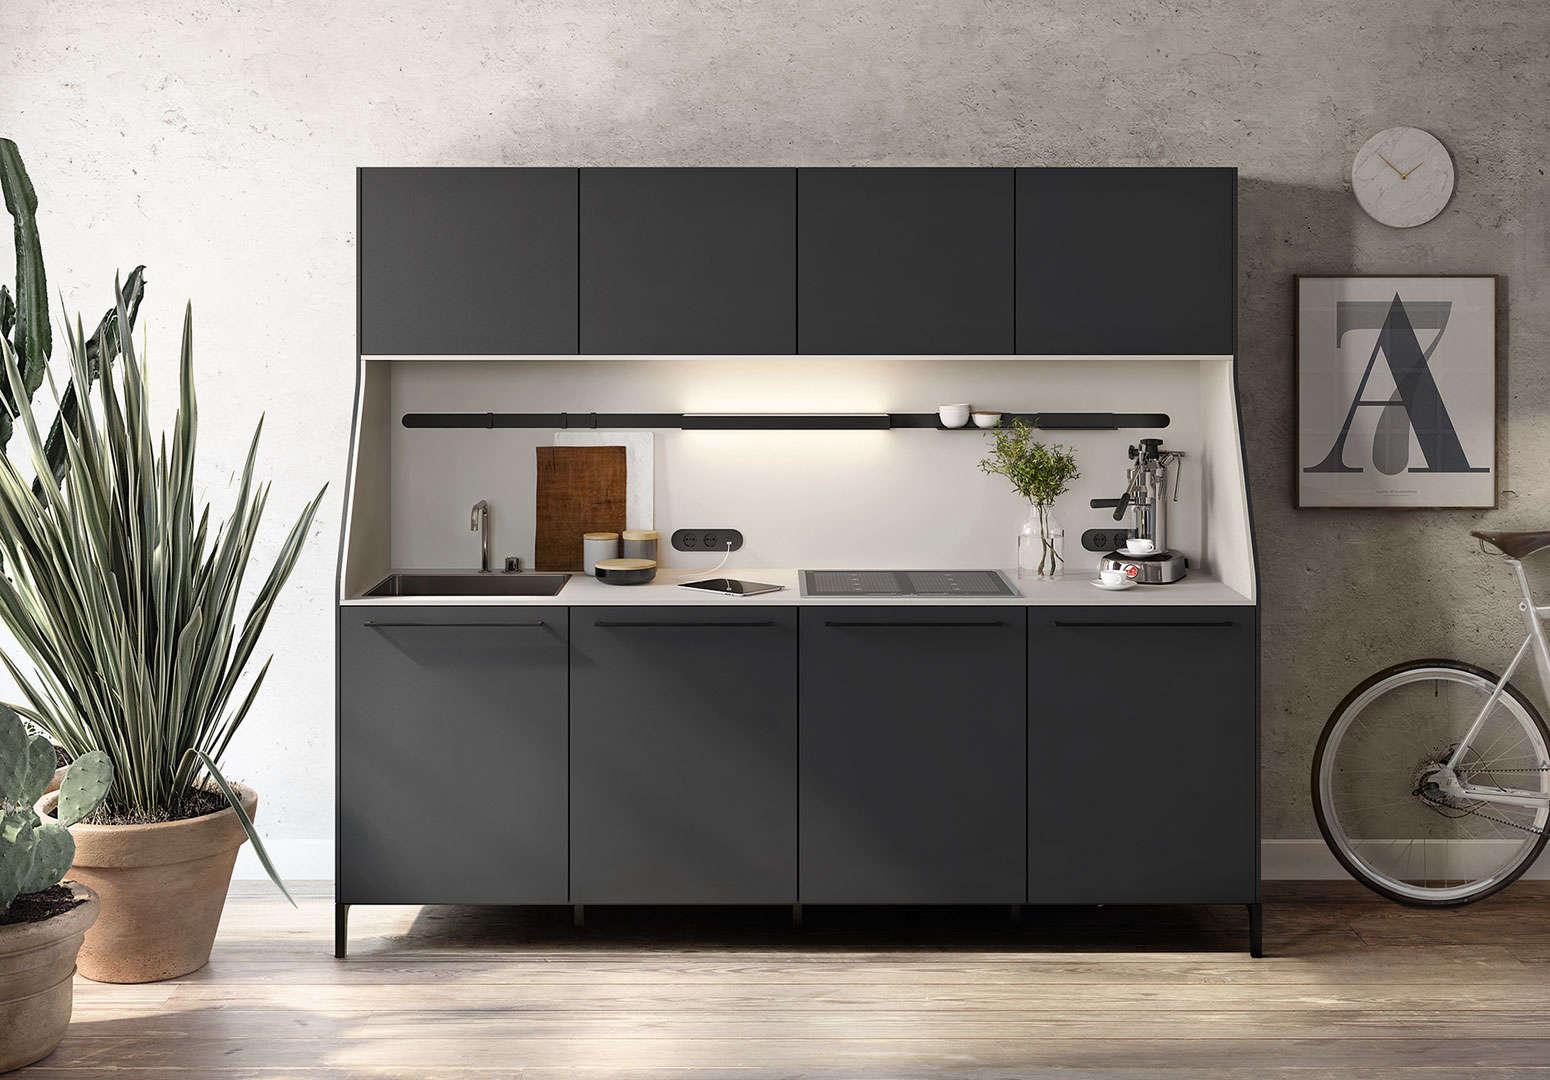 German Kitchen Furniture Kitchen Of The Week A Kitchen Modeled After A Sideboard Remodelista